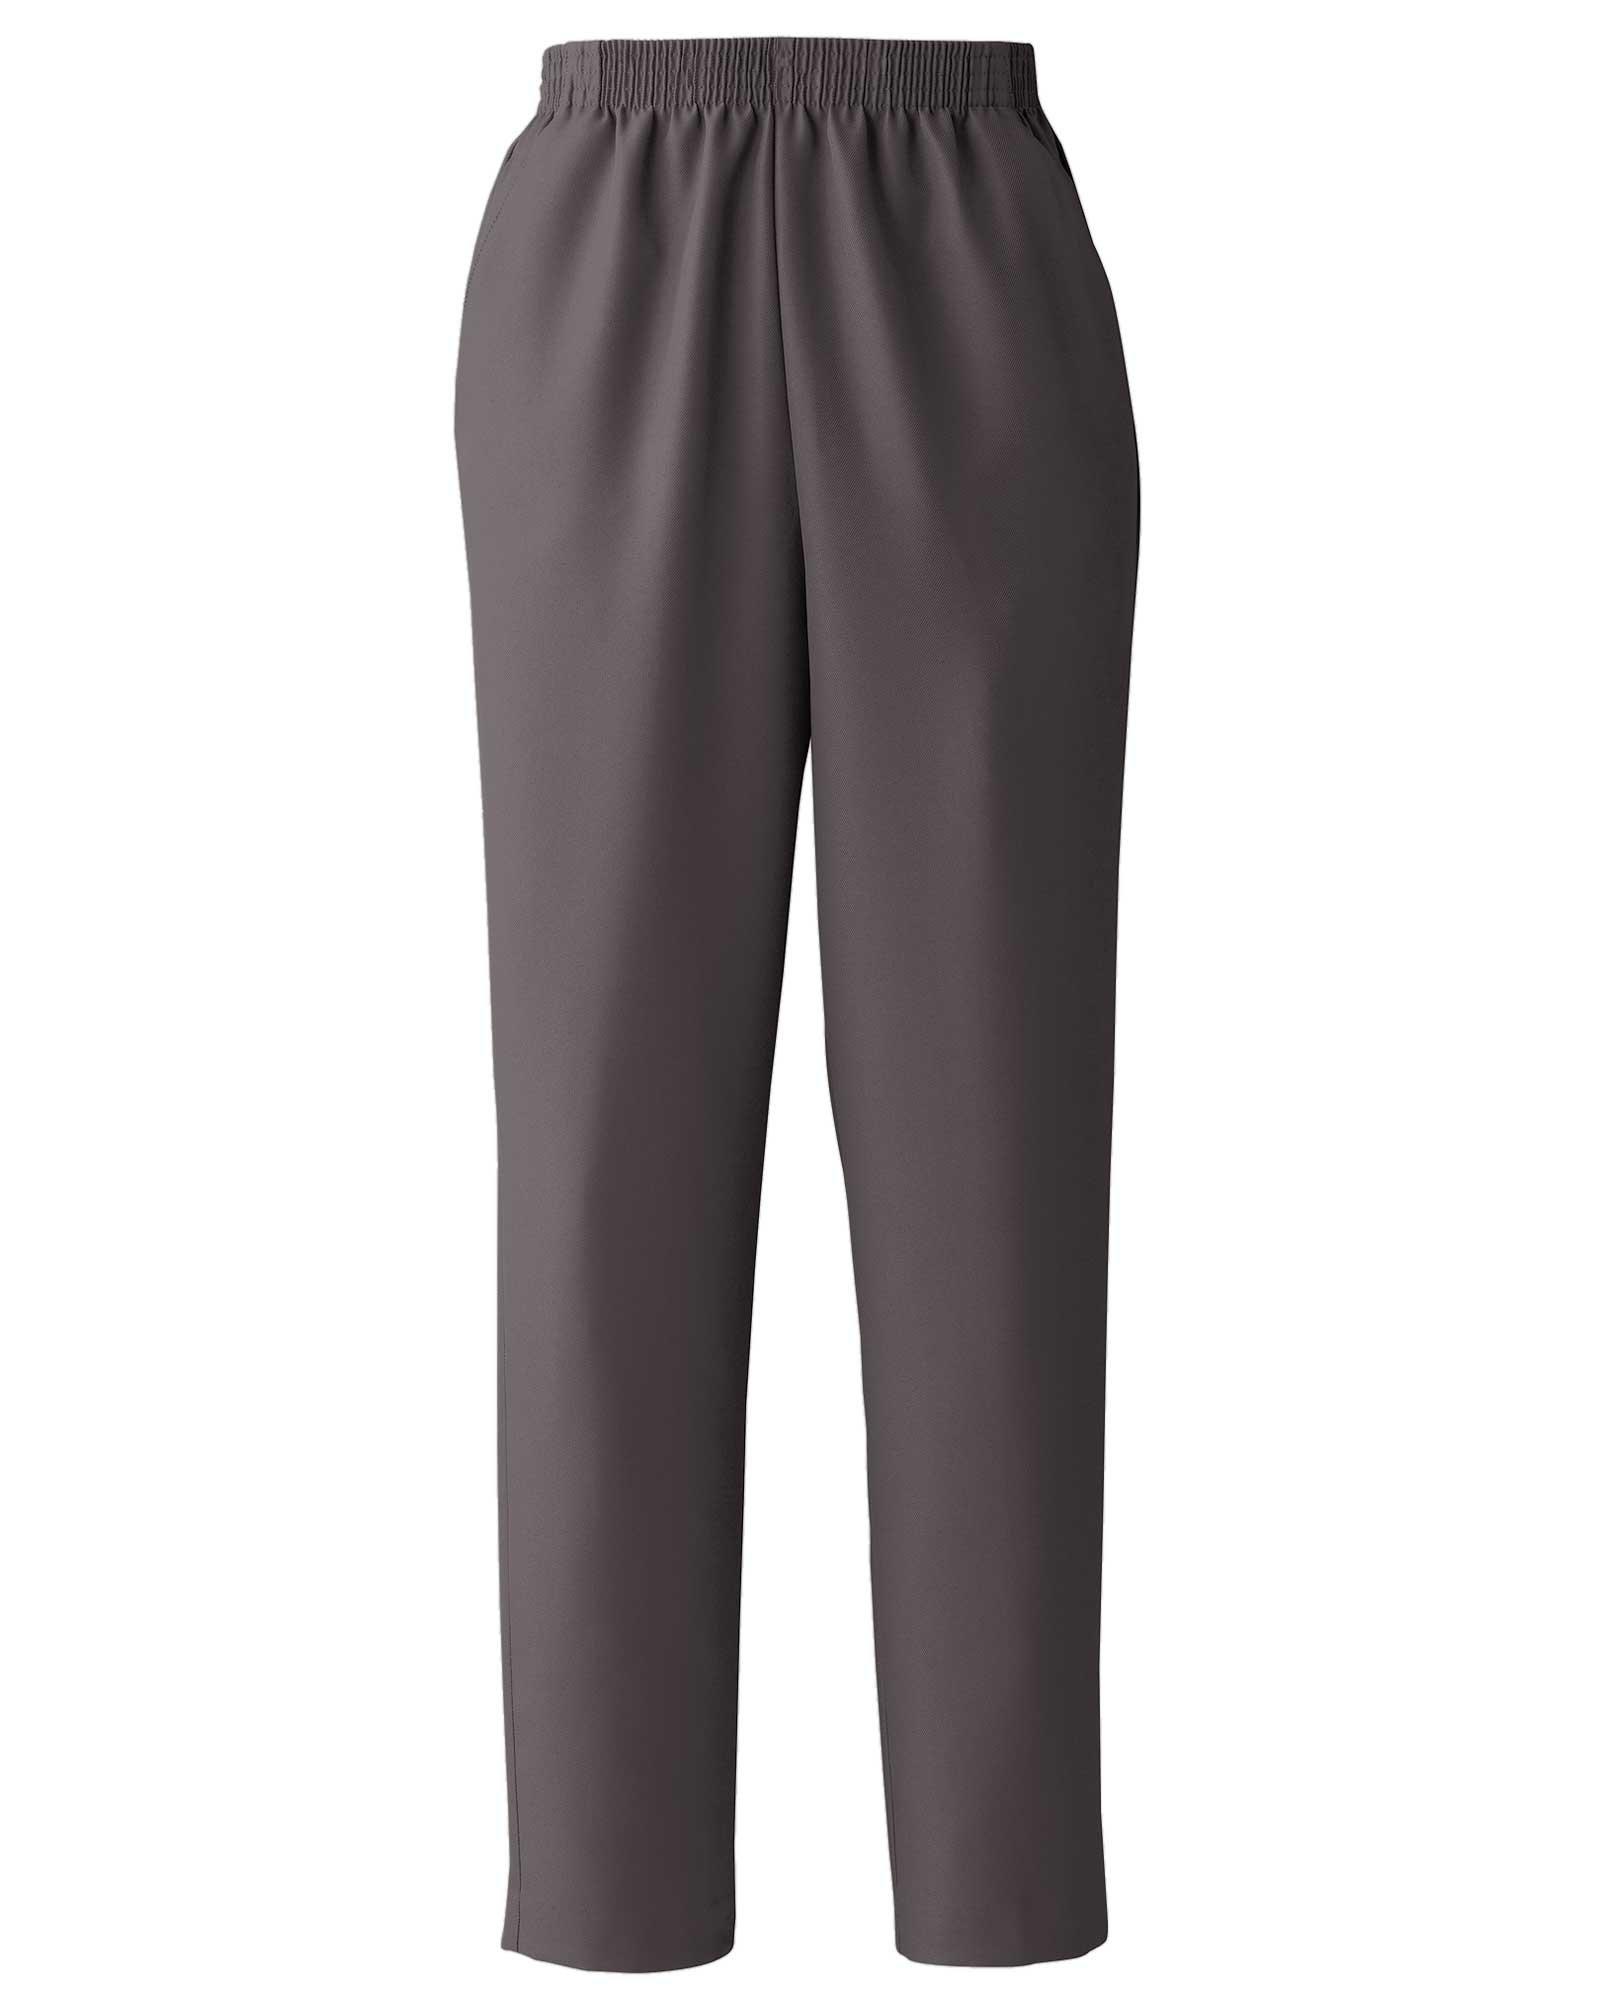 Donnkenny Elastic-Waist Gabardine Pull-On Pants, Charcoal, 12